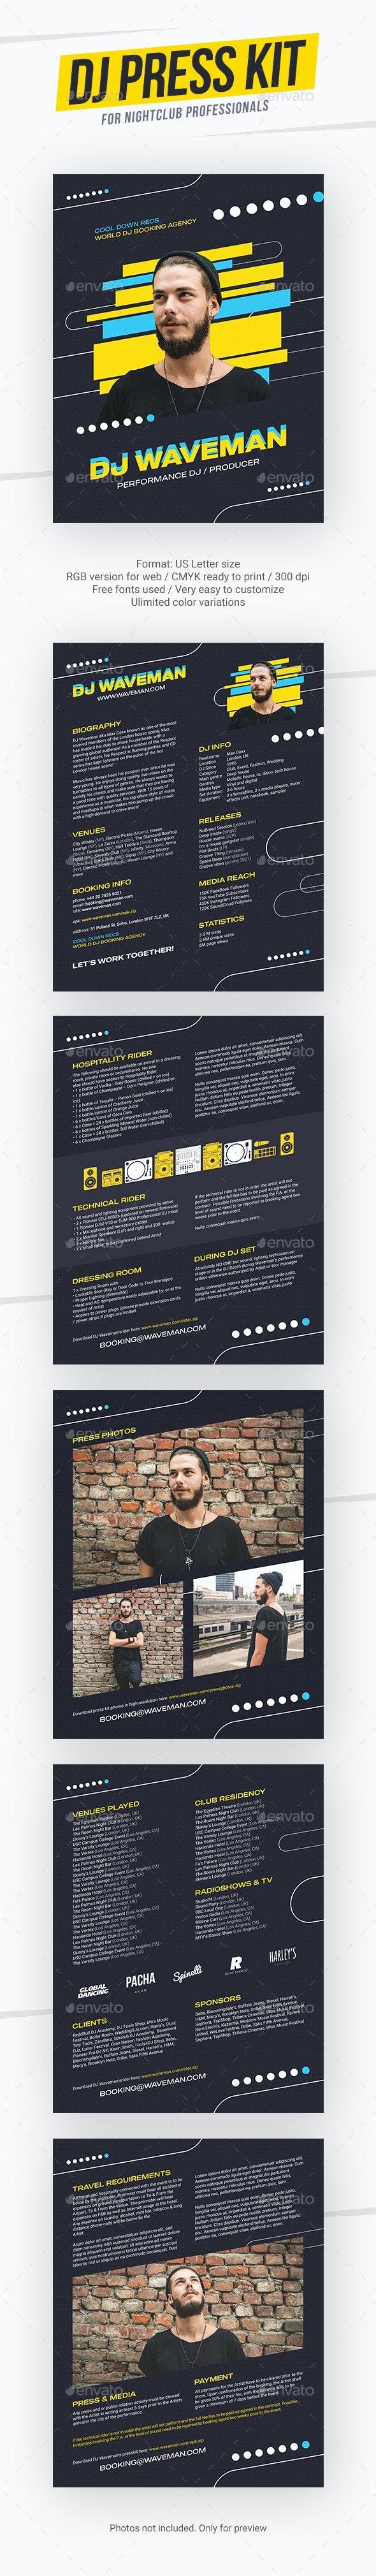 DJ Press Kit & Resume Template - Resumes Stationery